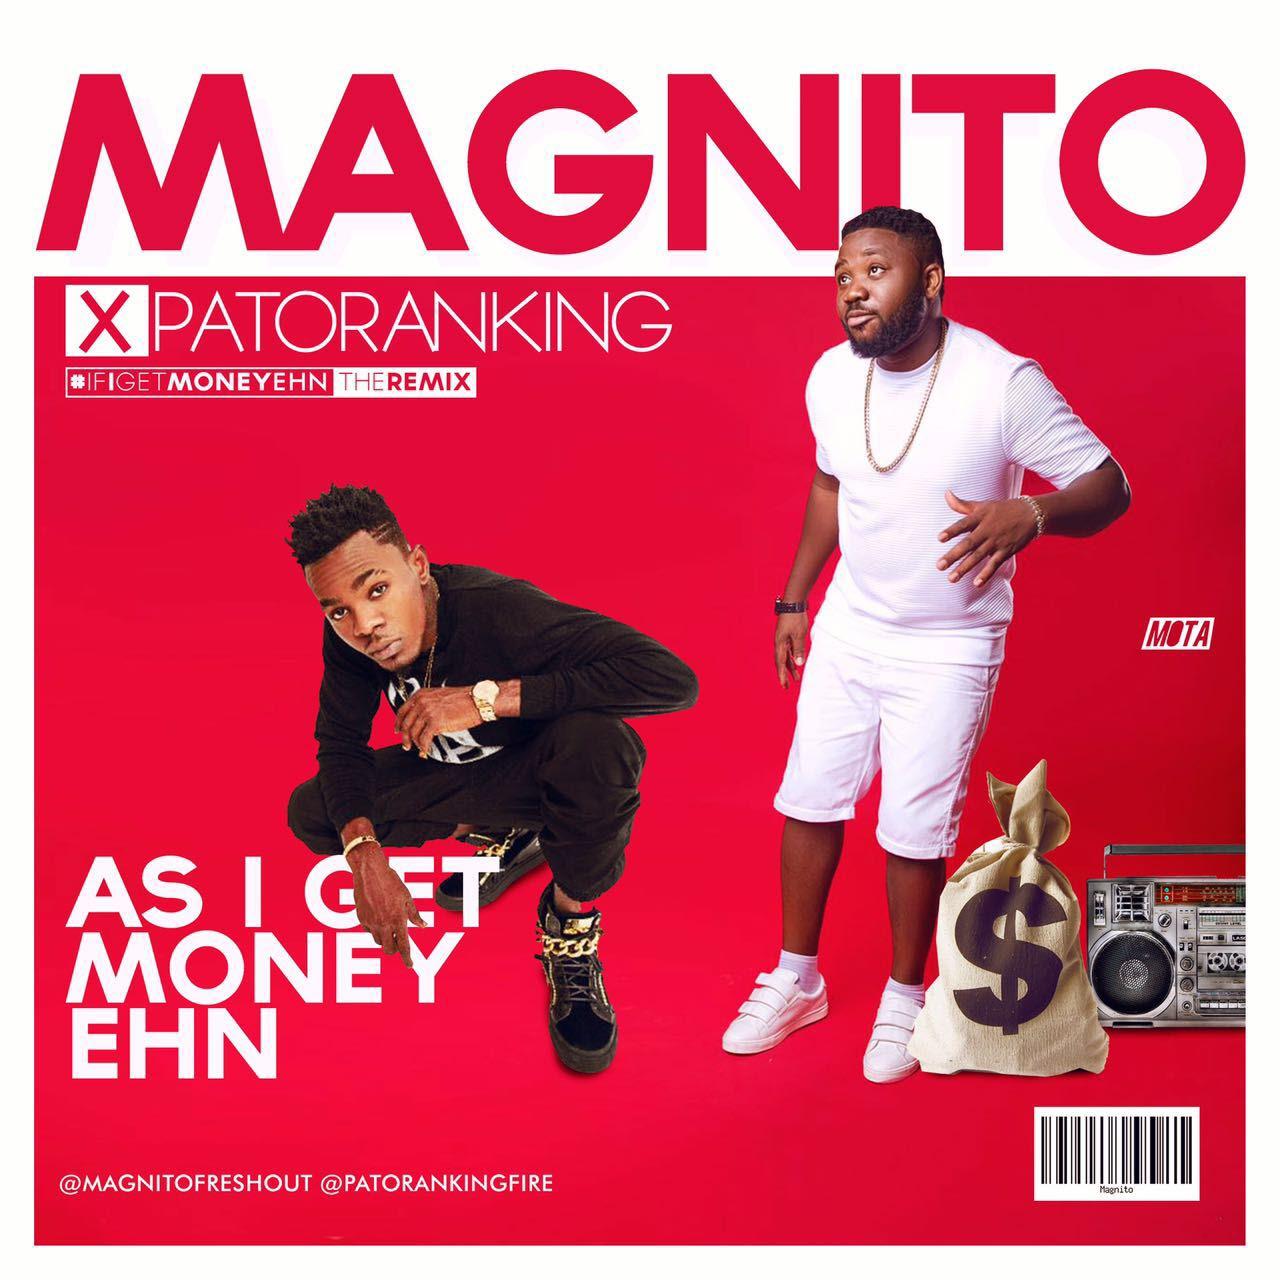 Magnito ft. Patoranking - As I Get Money Ehn